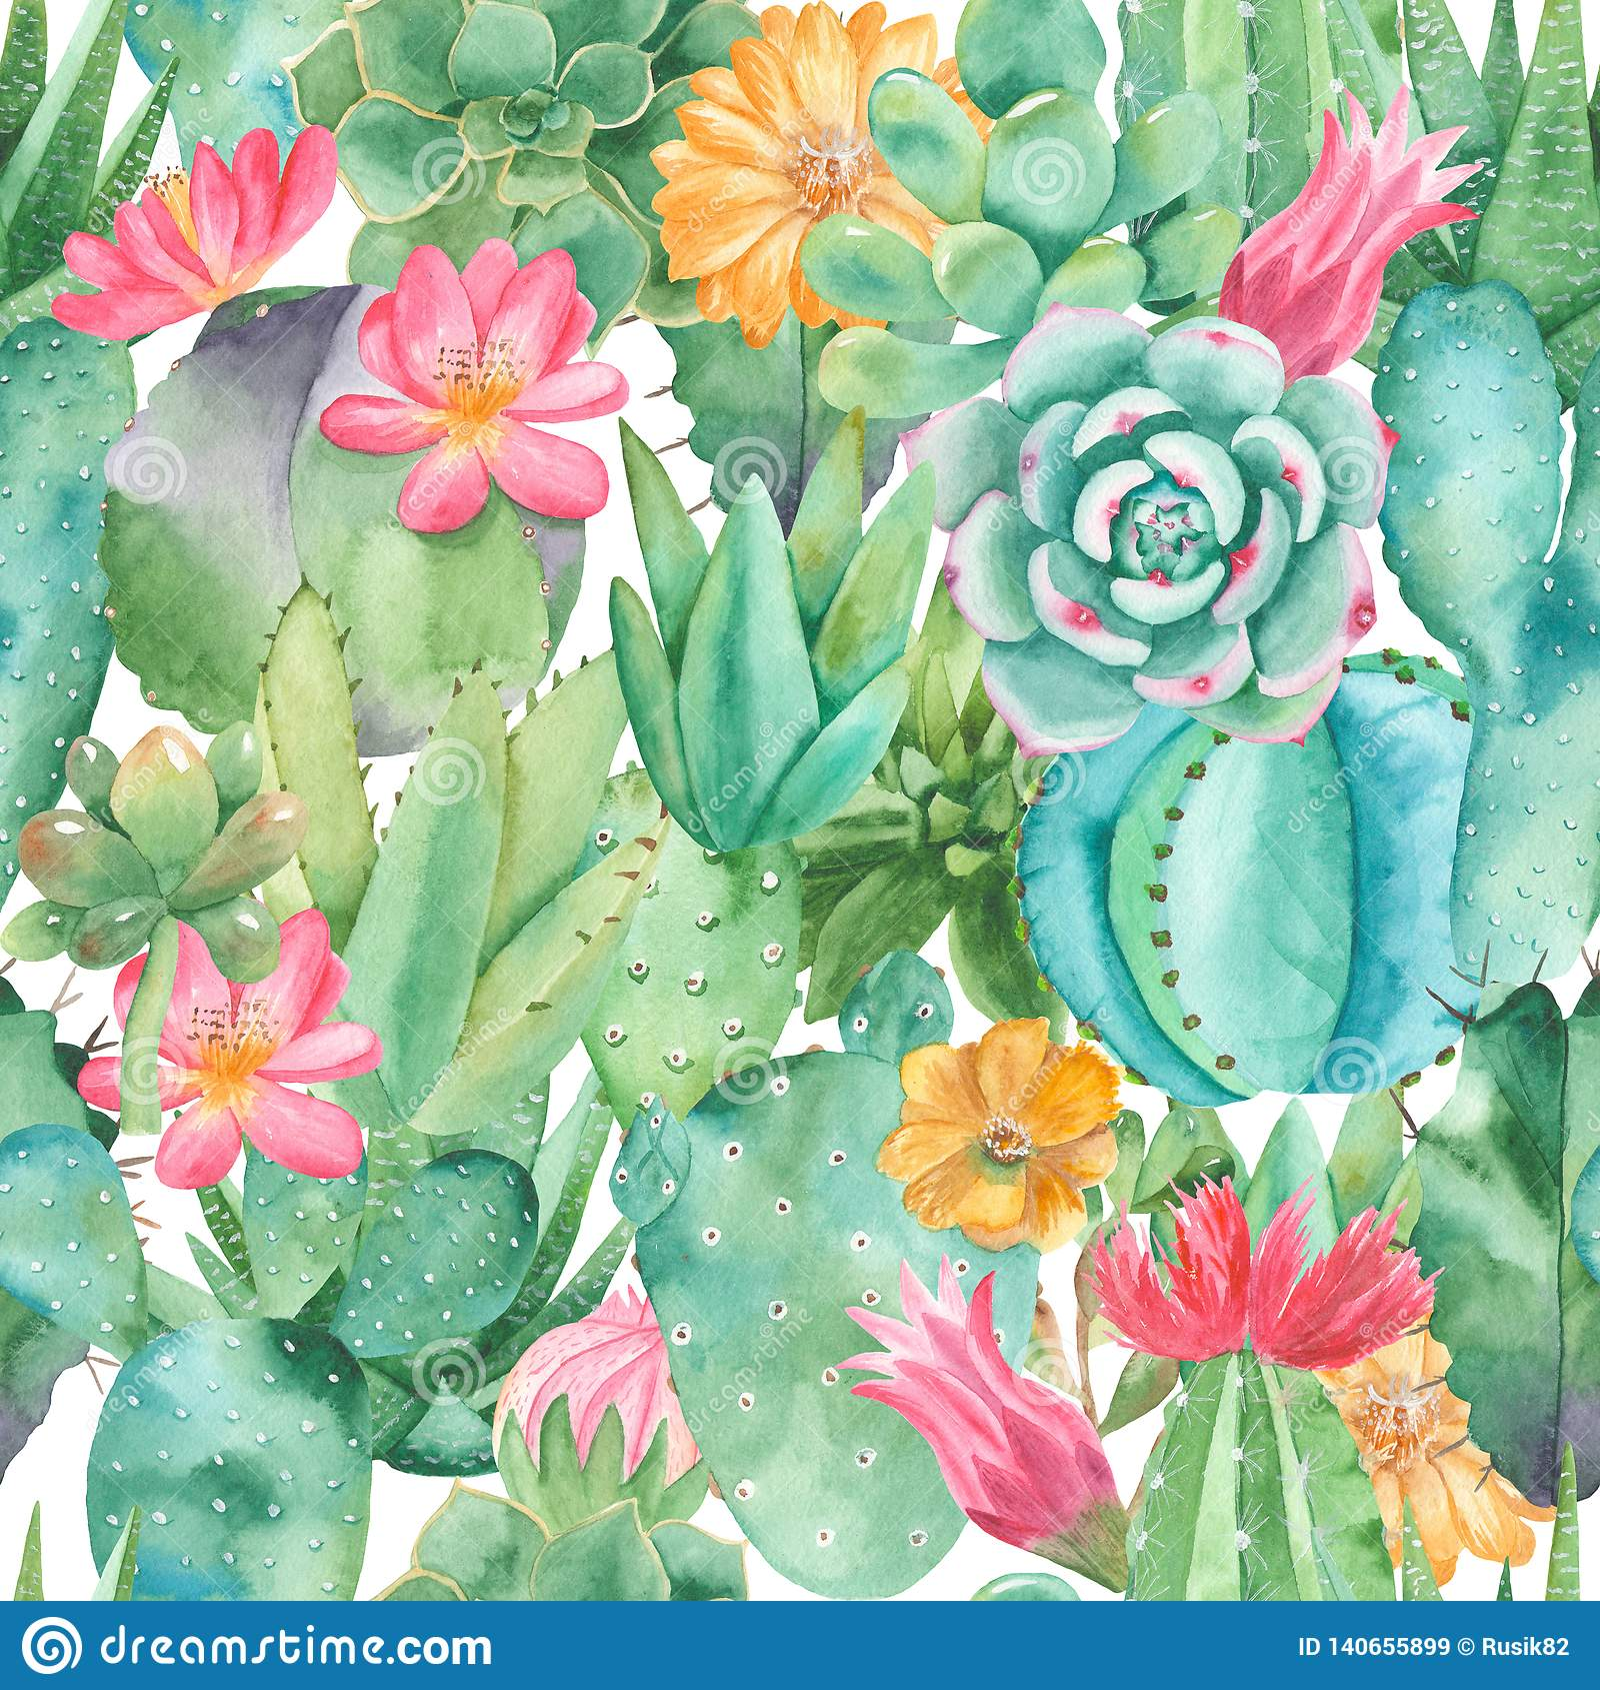 Watercolor Succulents Stock Illustrations 4 130 Watercolor Succulents Stock Illustrations Vectors Clipart Dreamstime